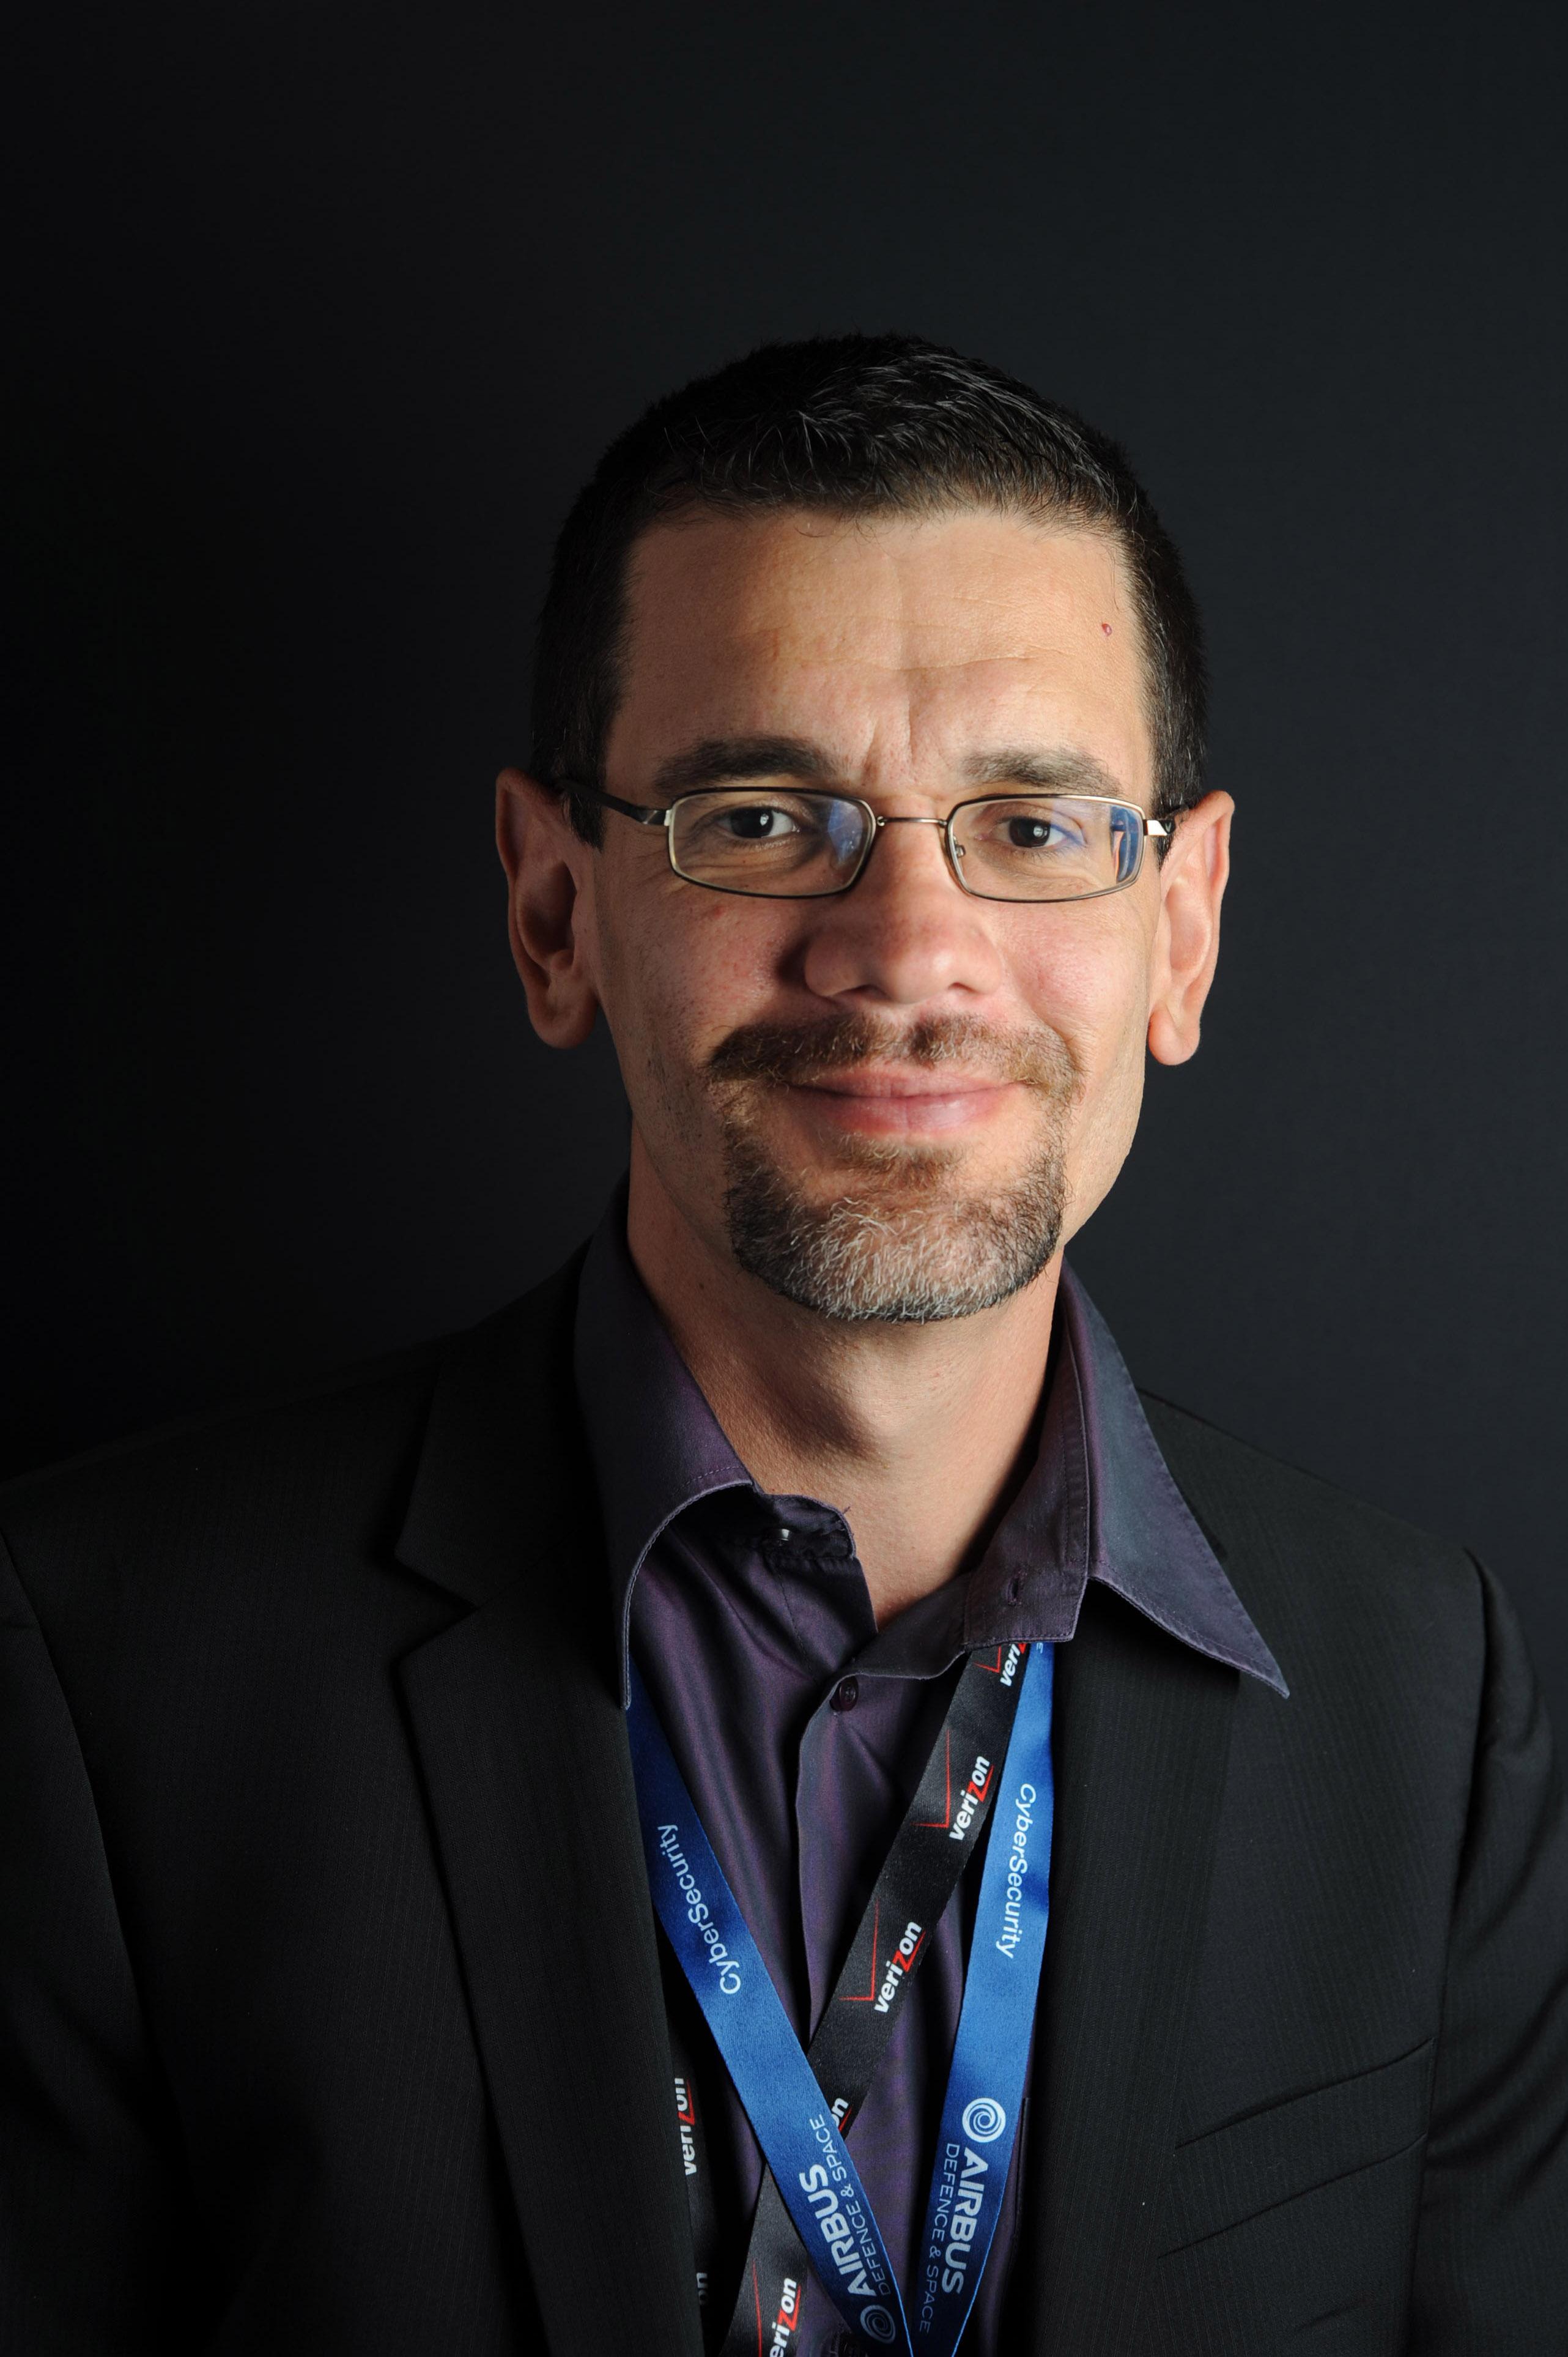 Gabriel Leperlier, senior manager Security Assurance Emea di Verizon Business,